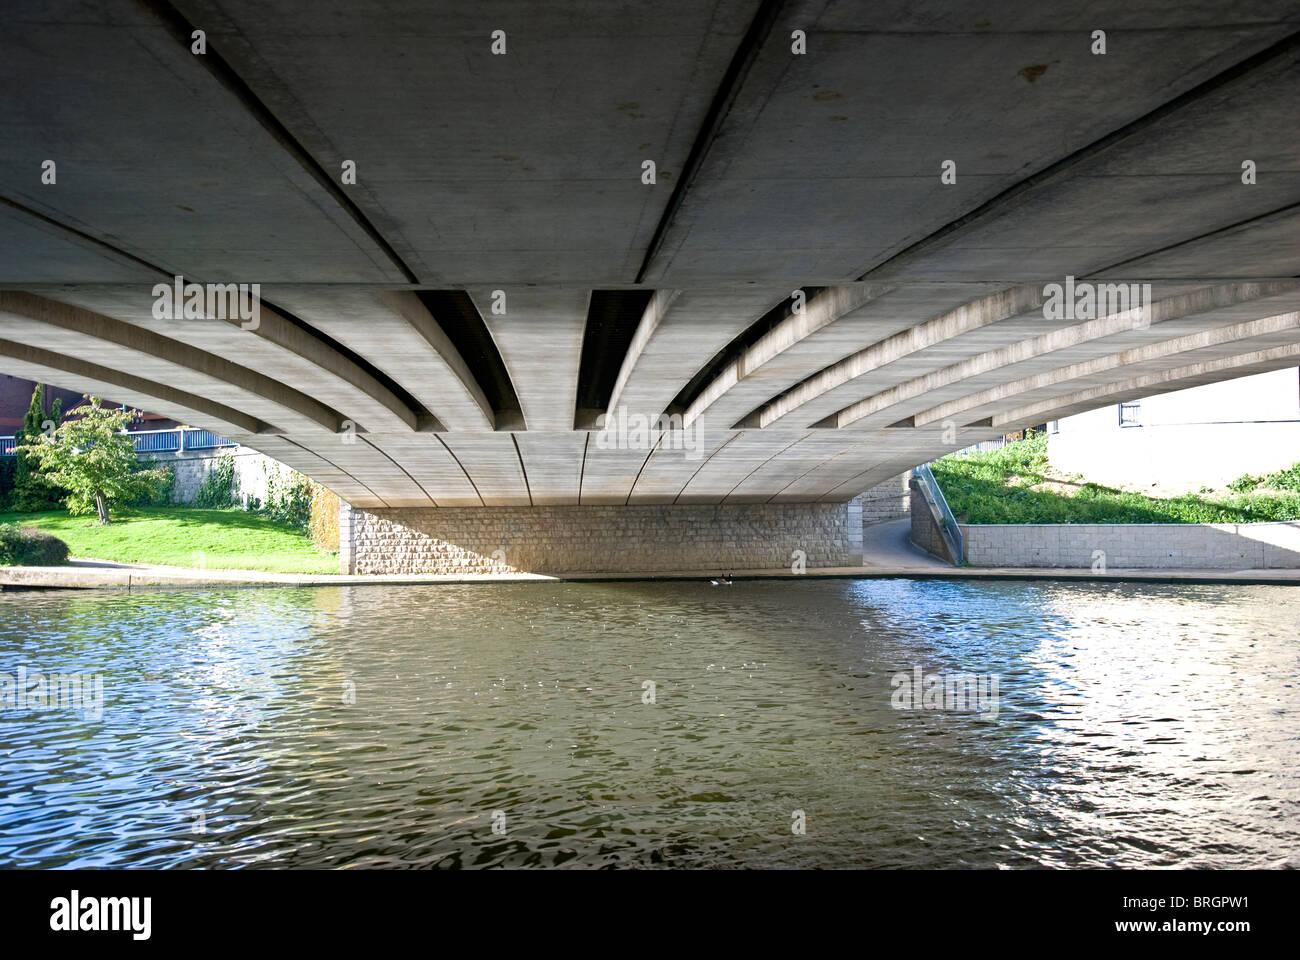 Underneath a river bridge - Stock Image